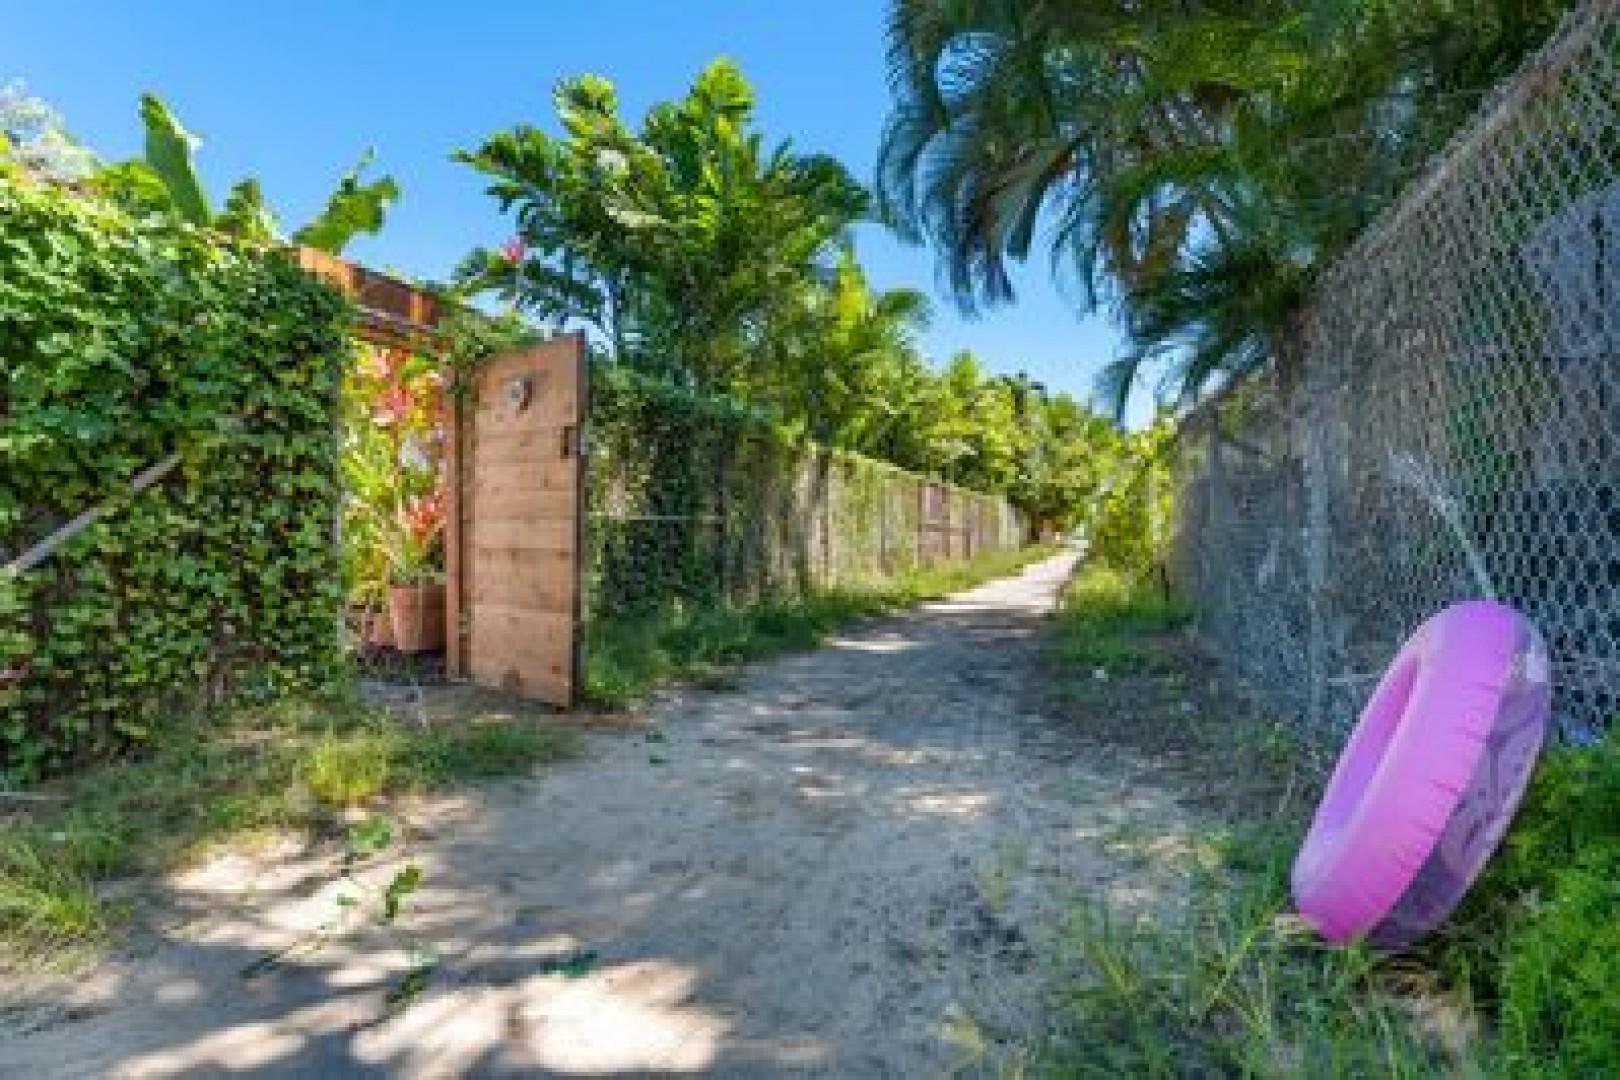 Private access to beach lane